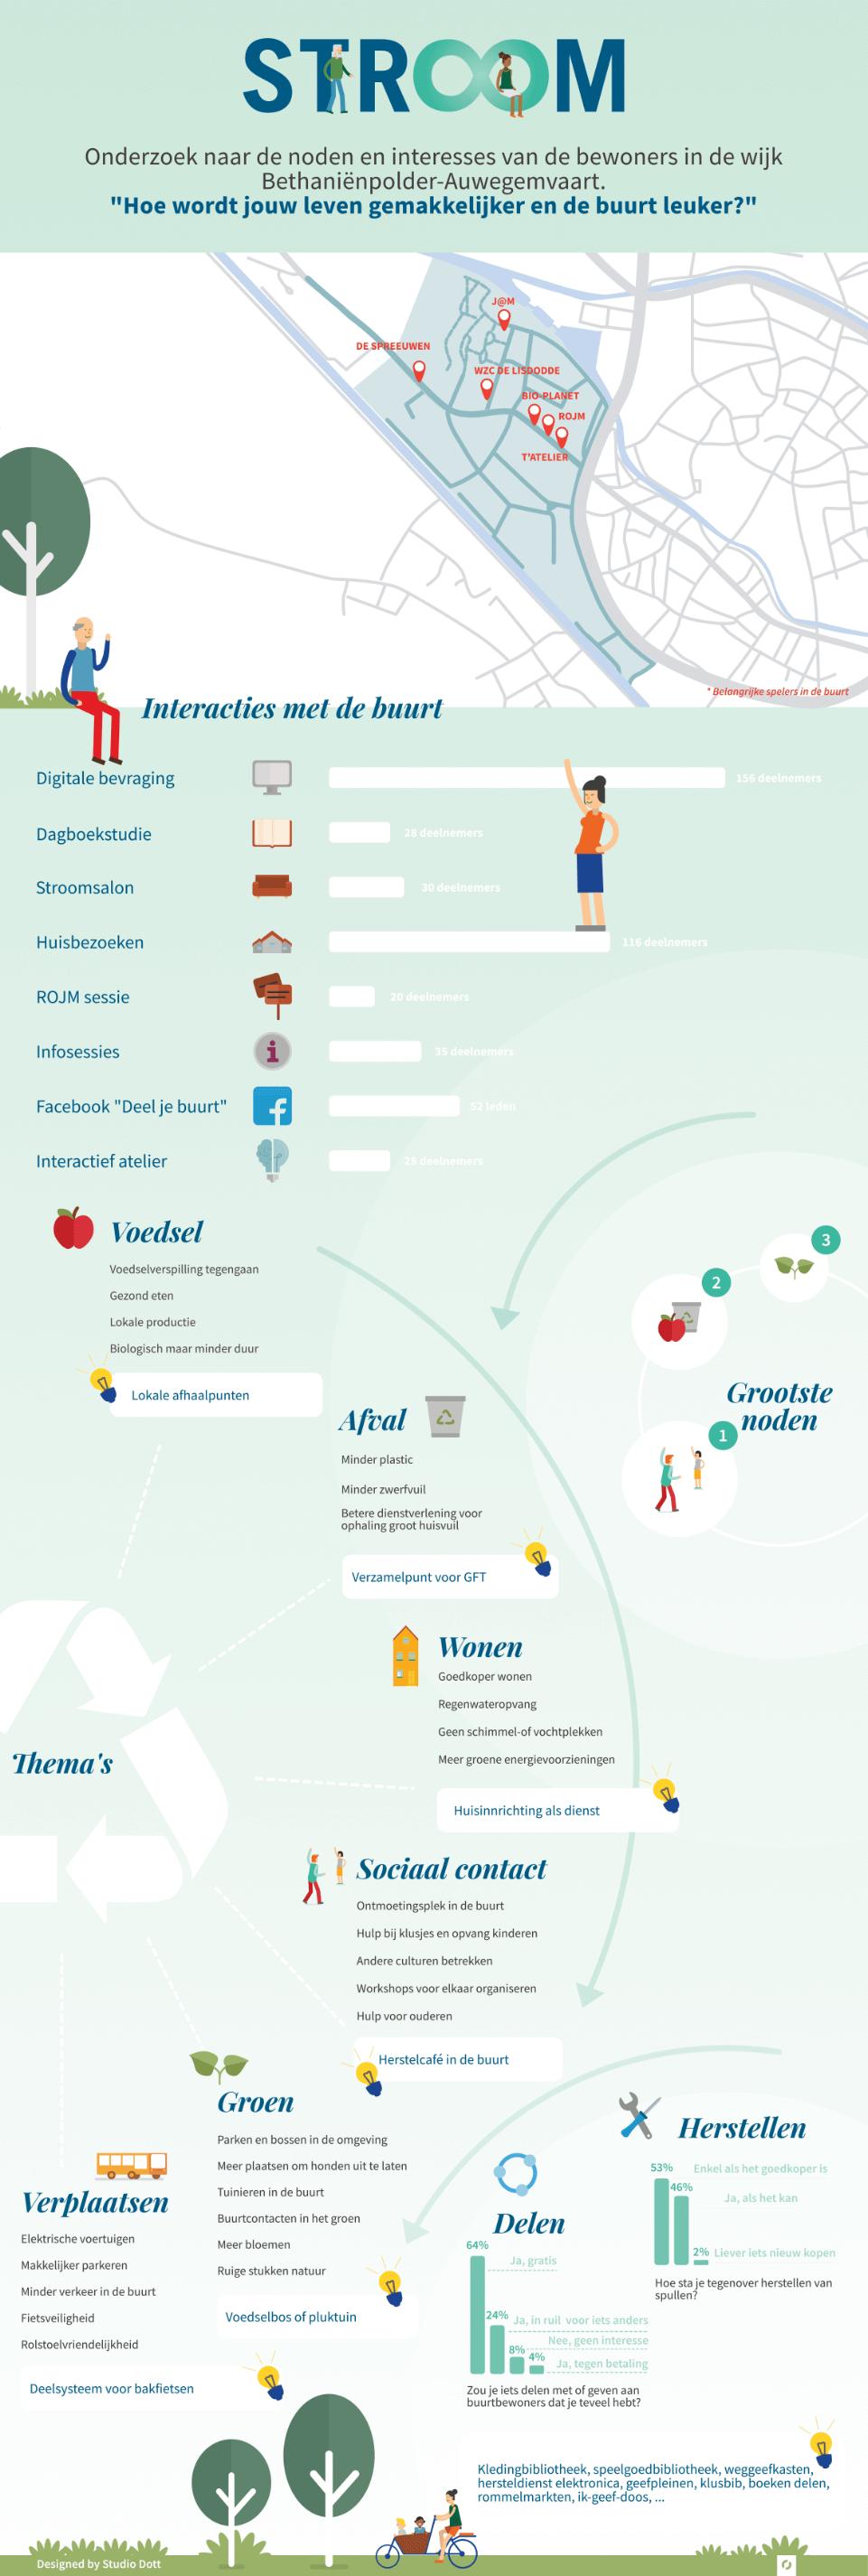 Stroom infographic